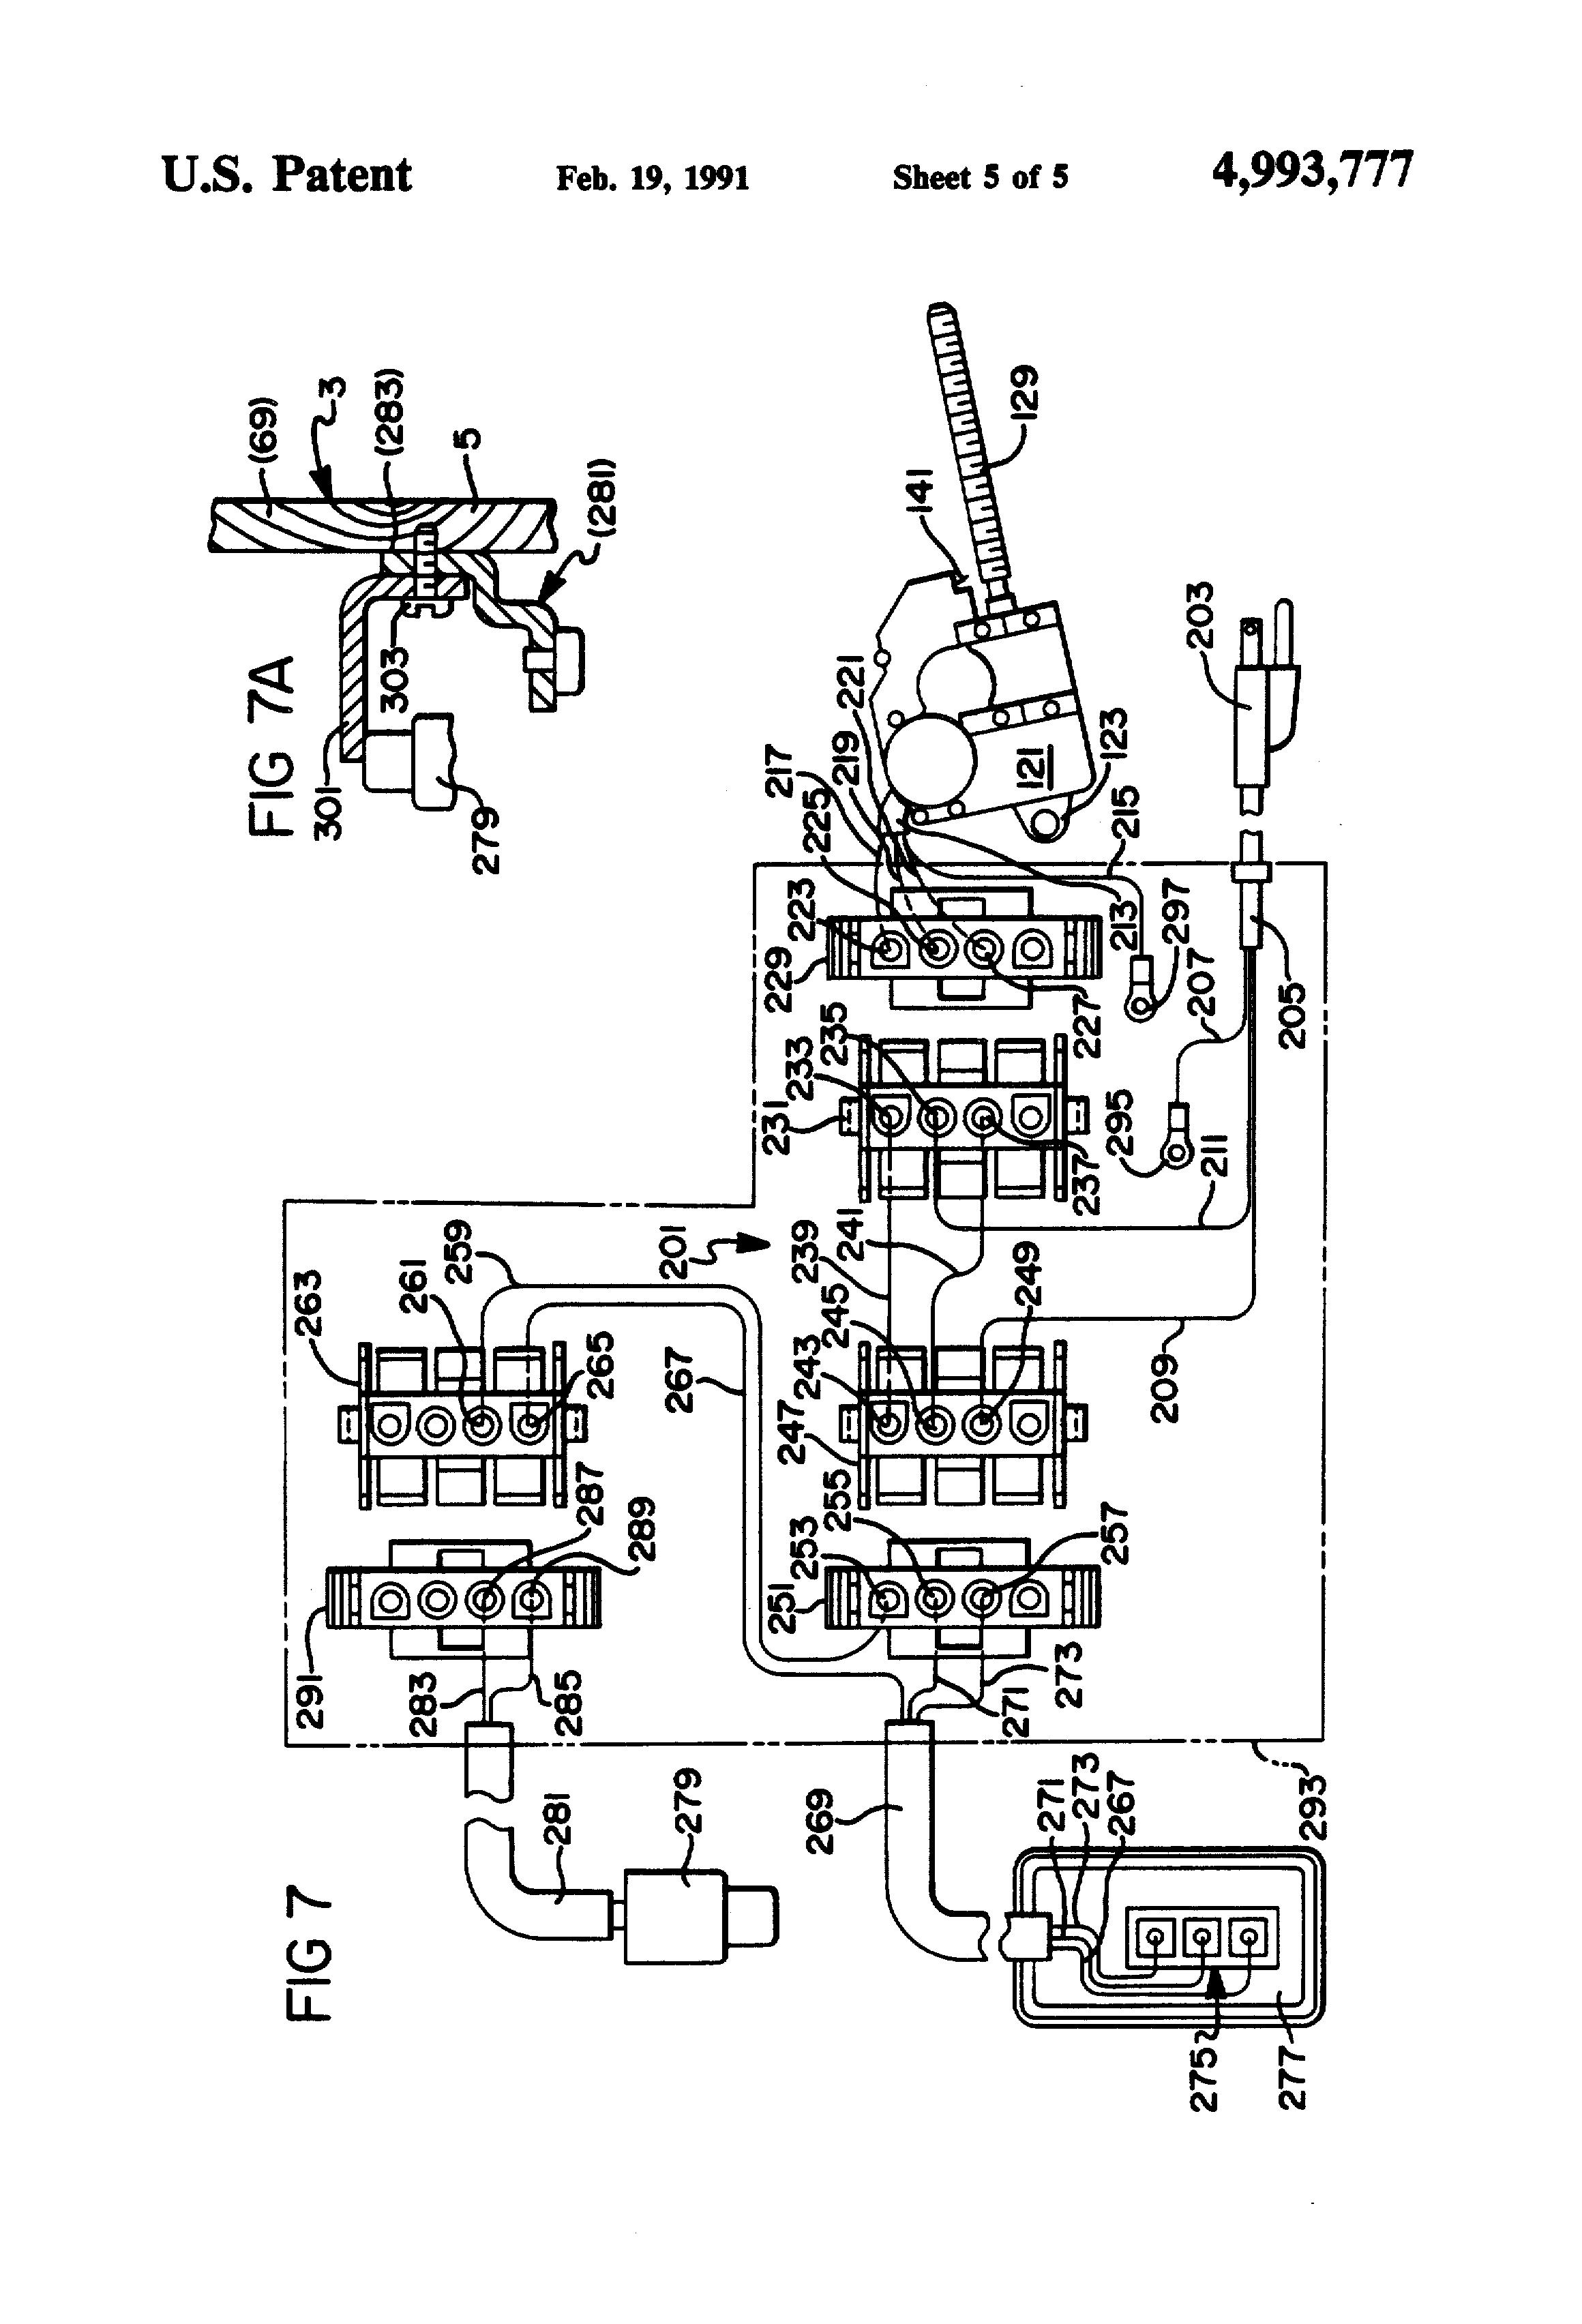 Jazzy 600 Wiring Diagram - Catalogue of Schemas on